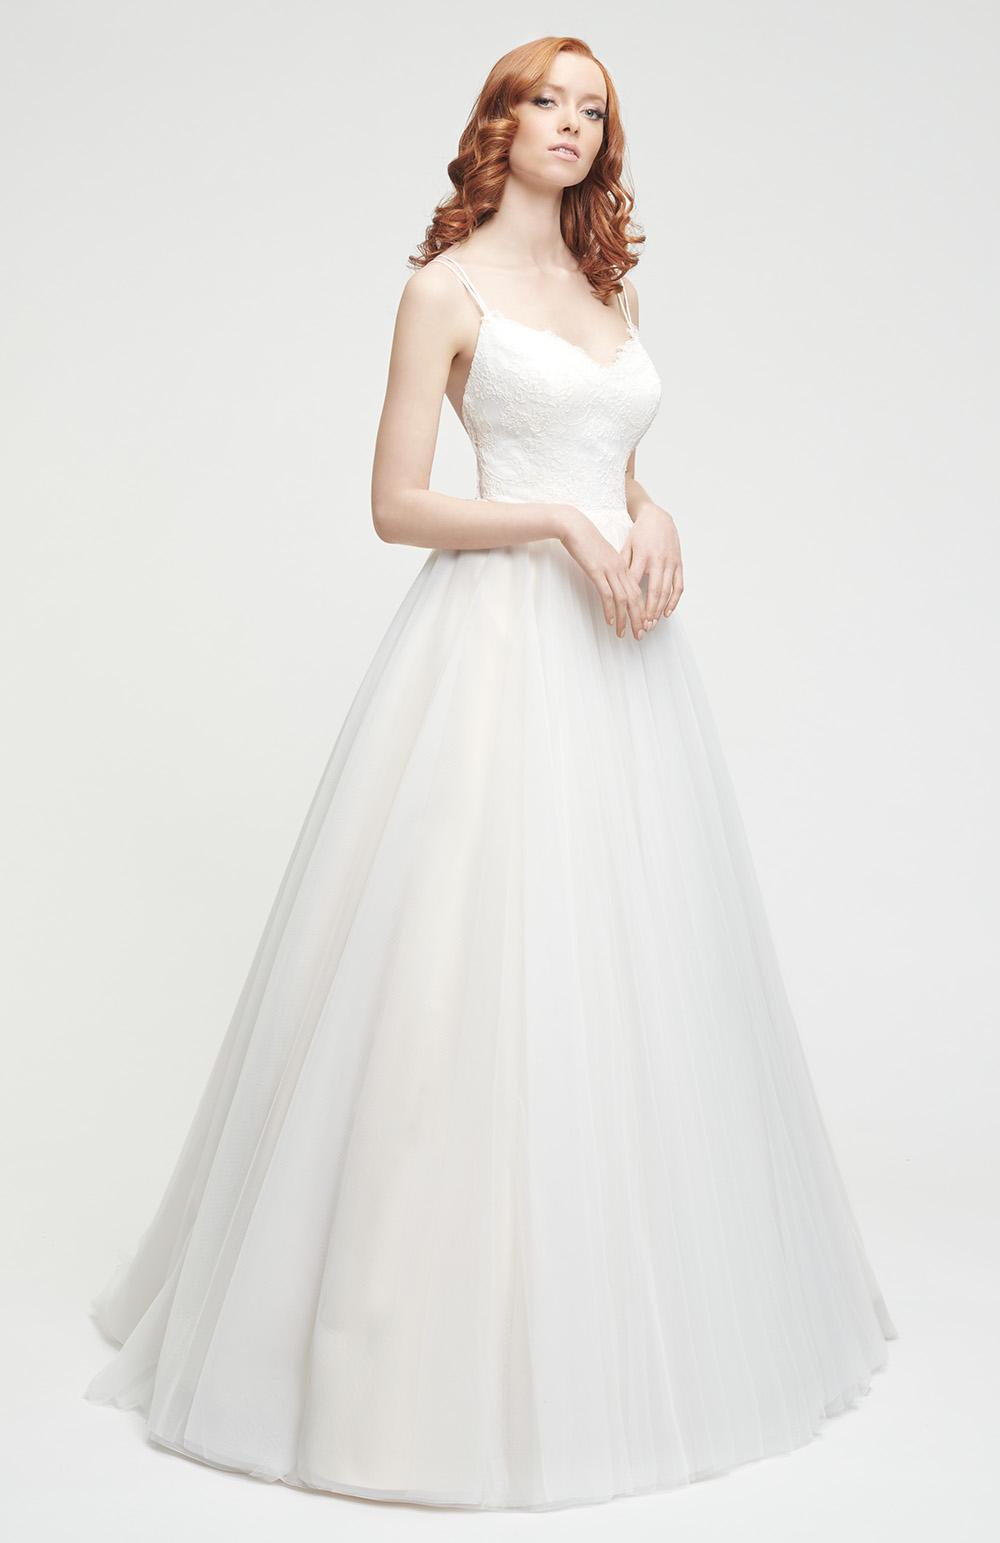 Robe de mariée Modèle Rima